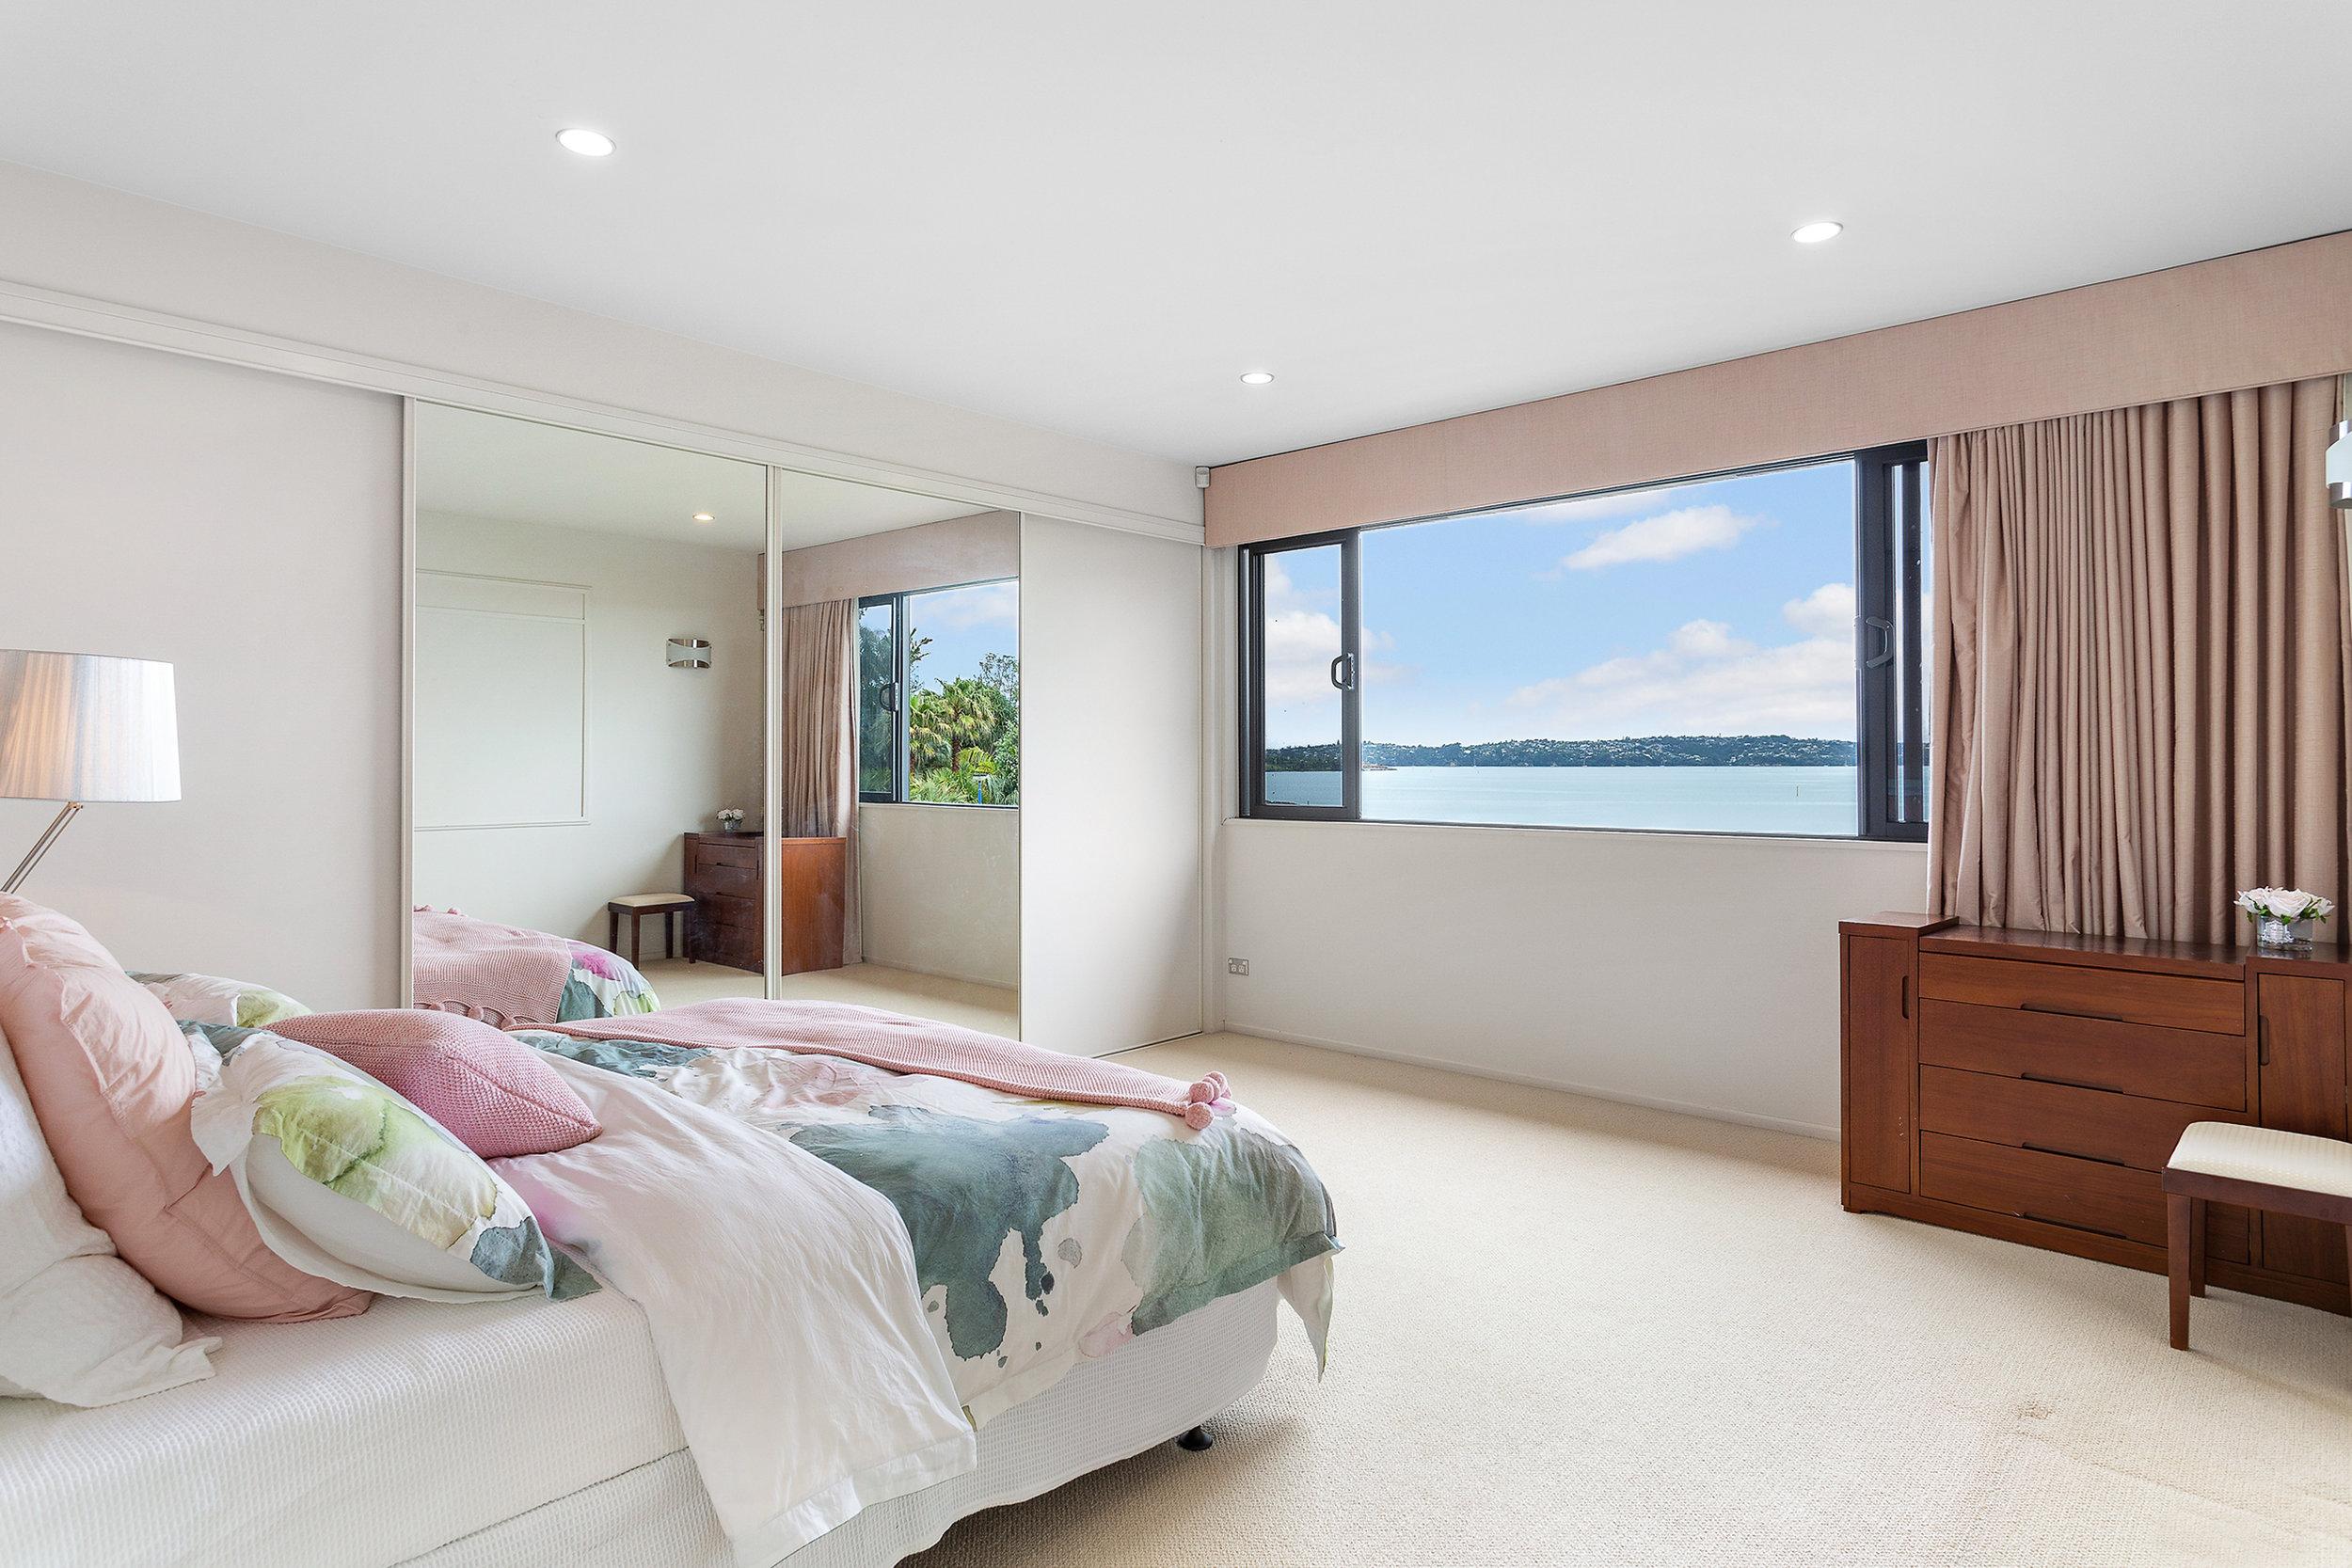 Bed14.jpg